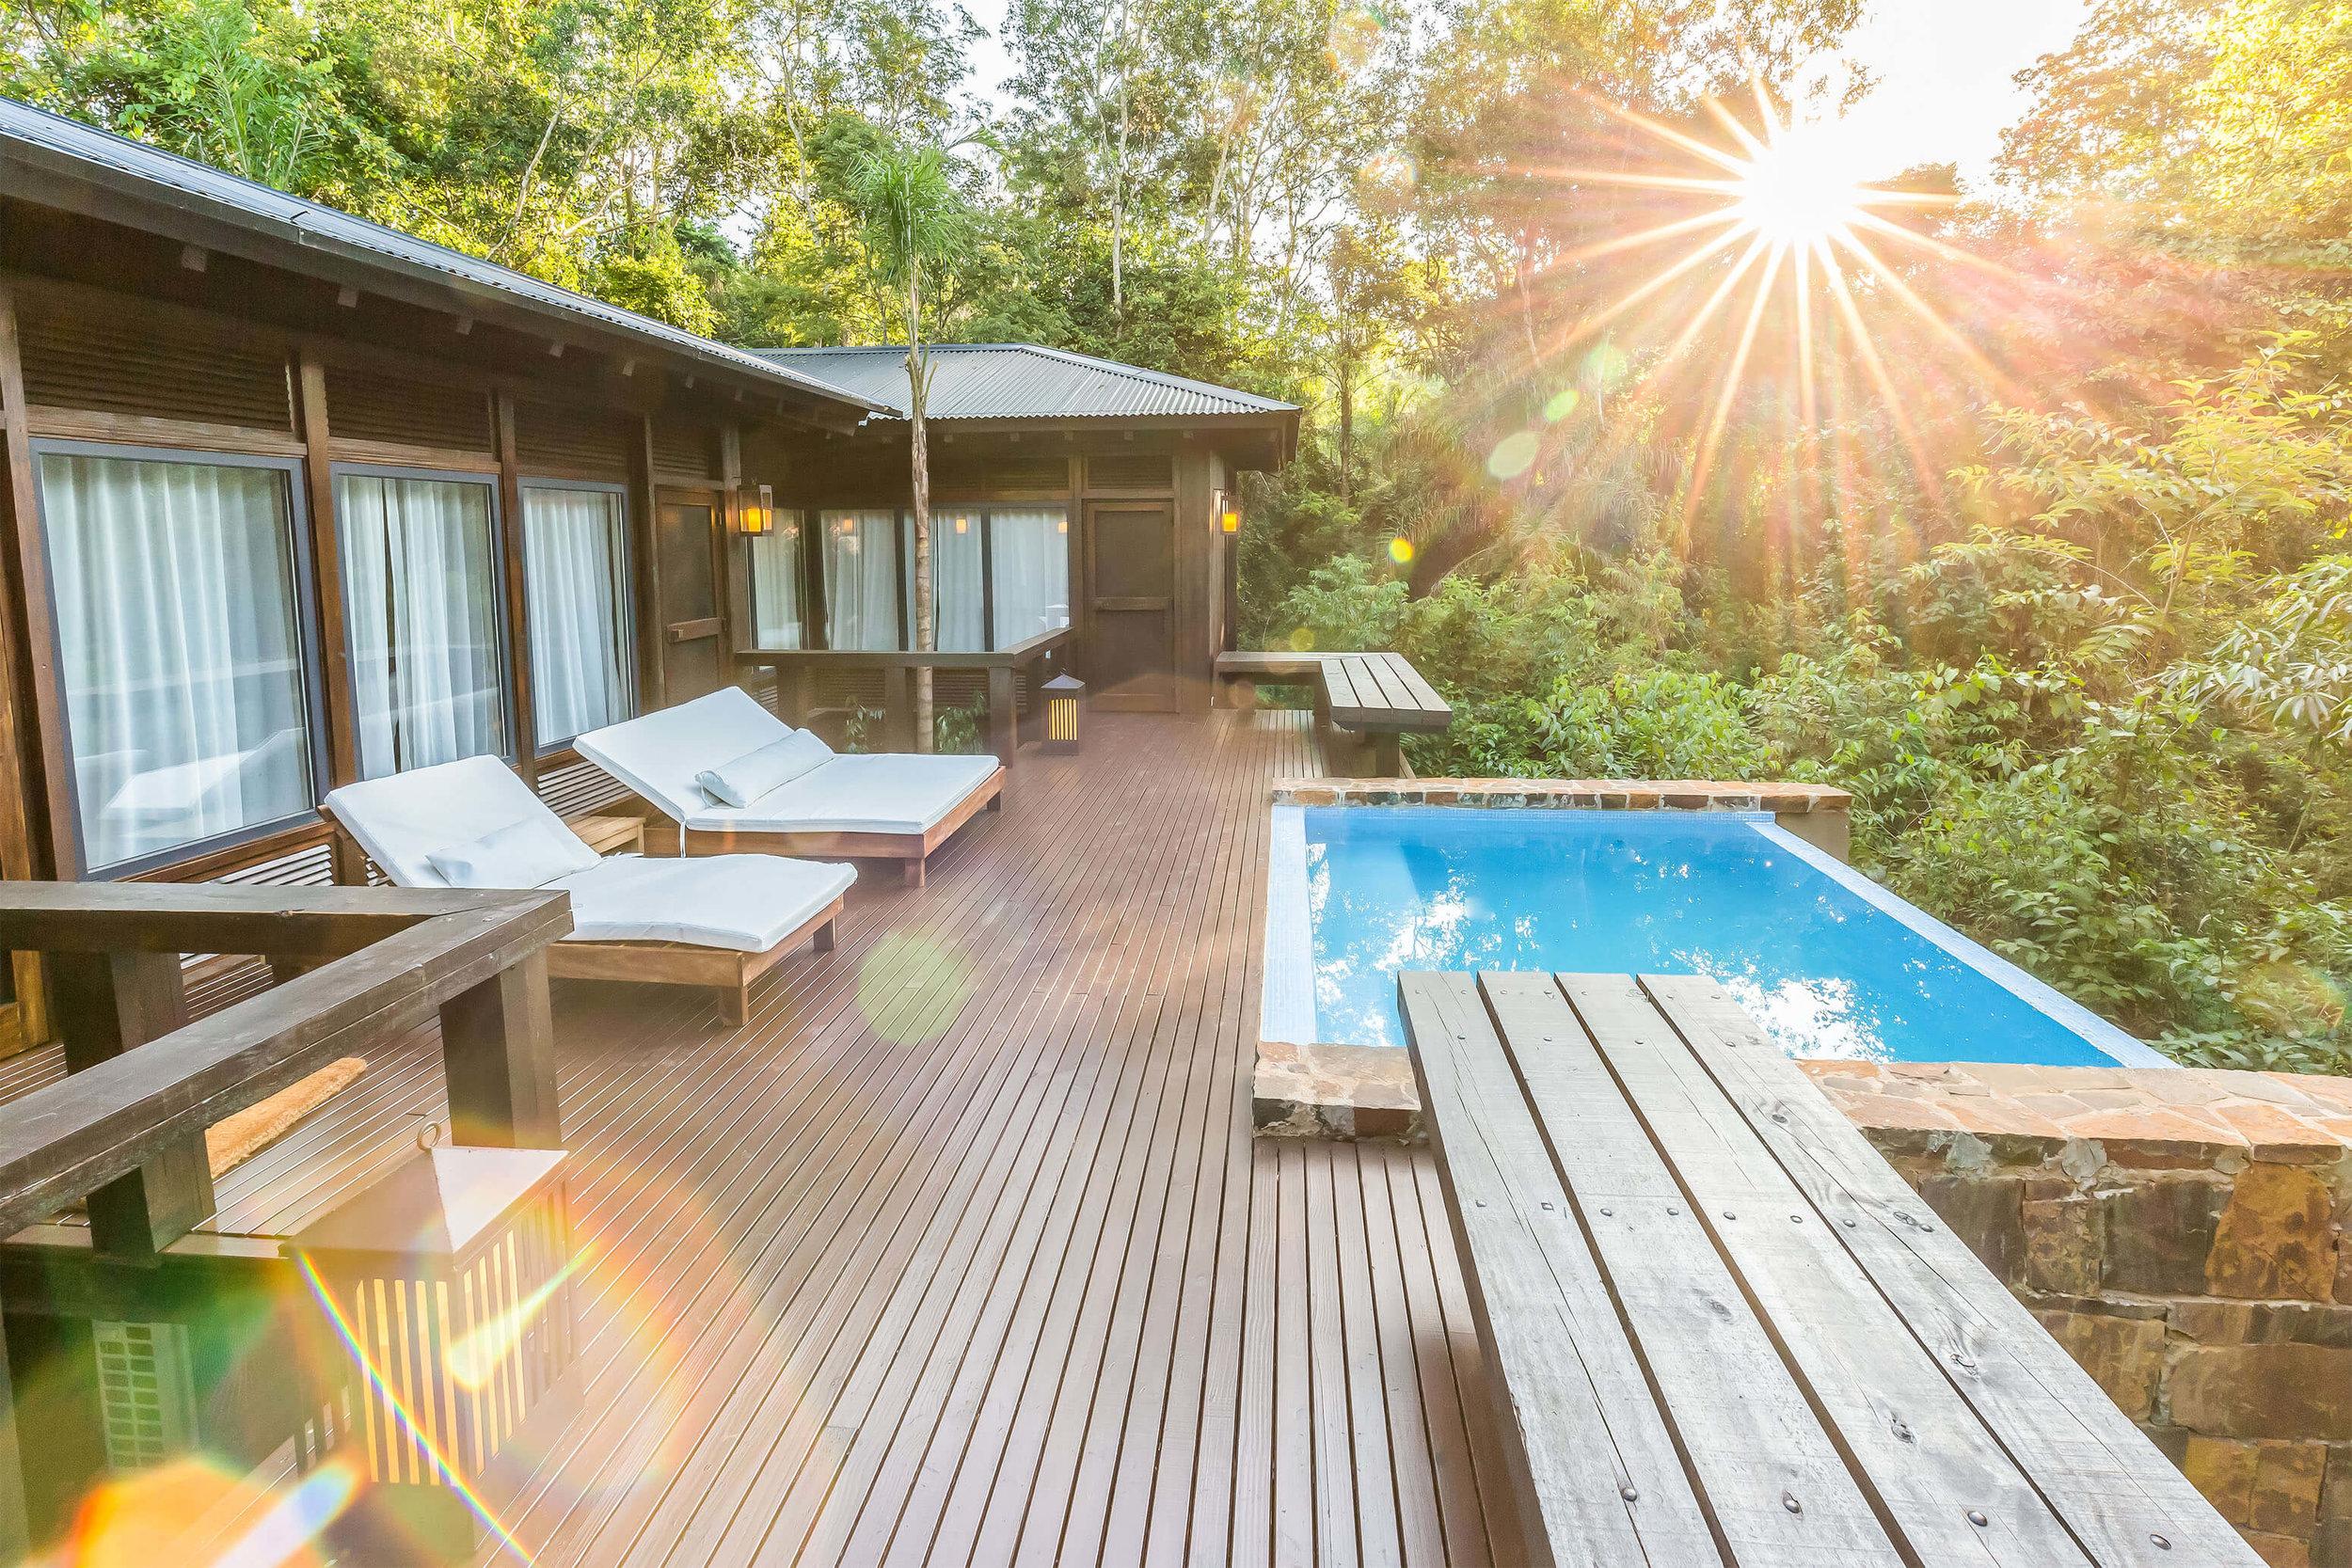 Awasi Iguazu - Master Villa .14 - PH Evan Austen copy.jpg